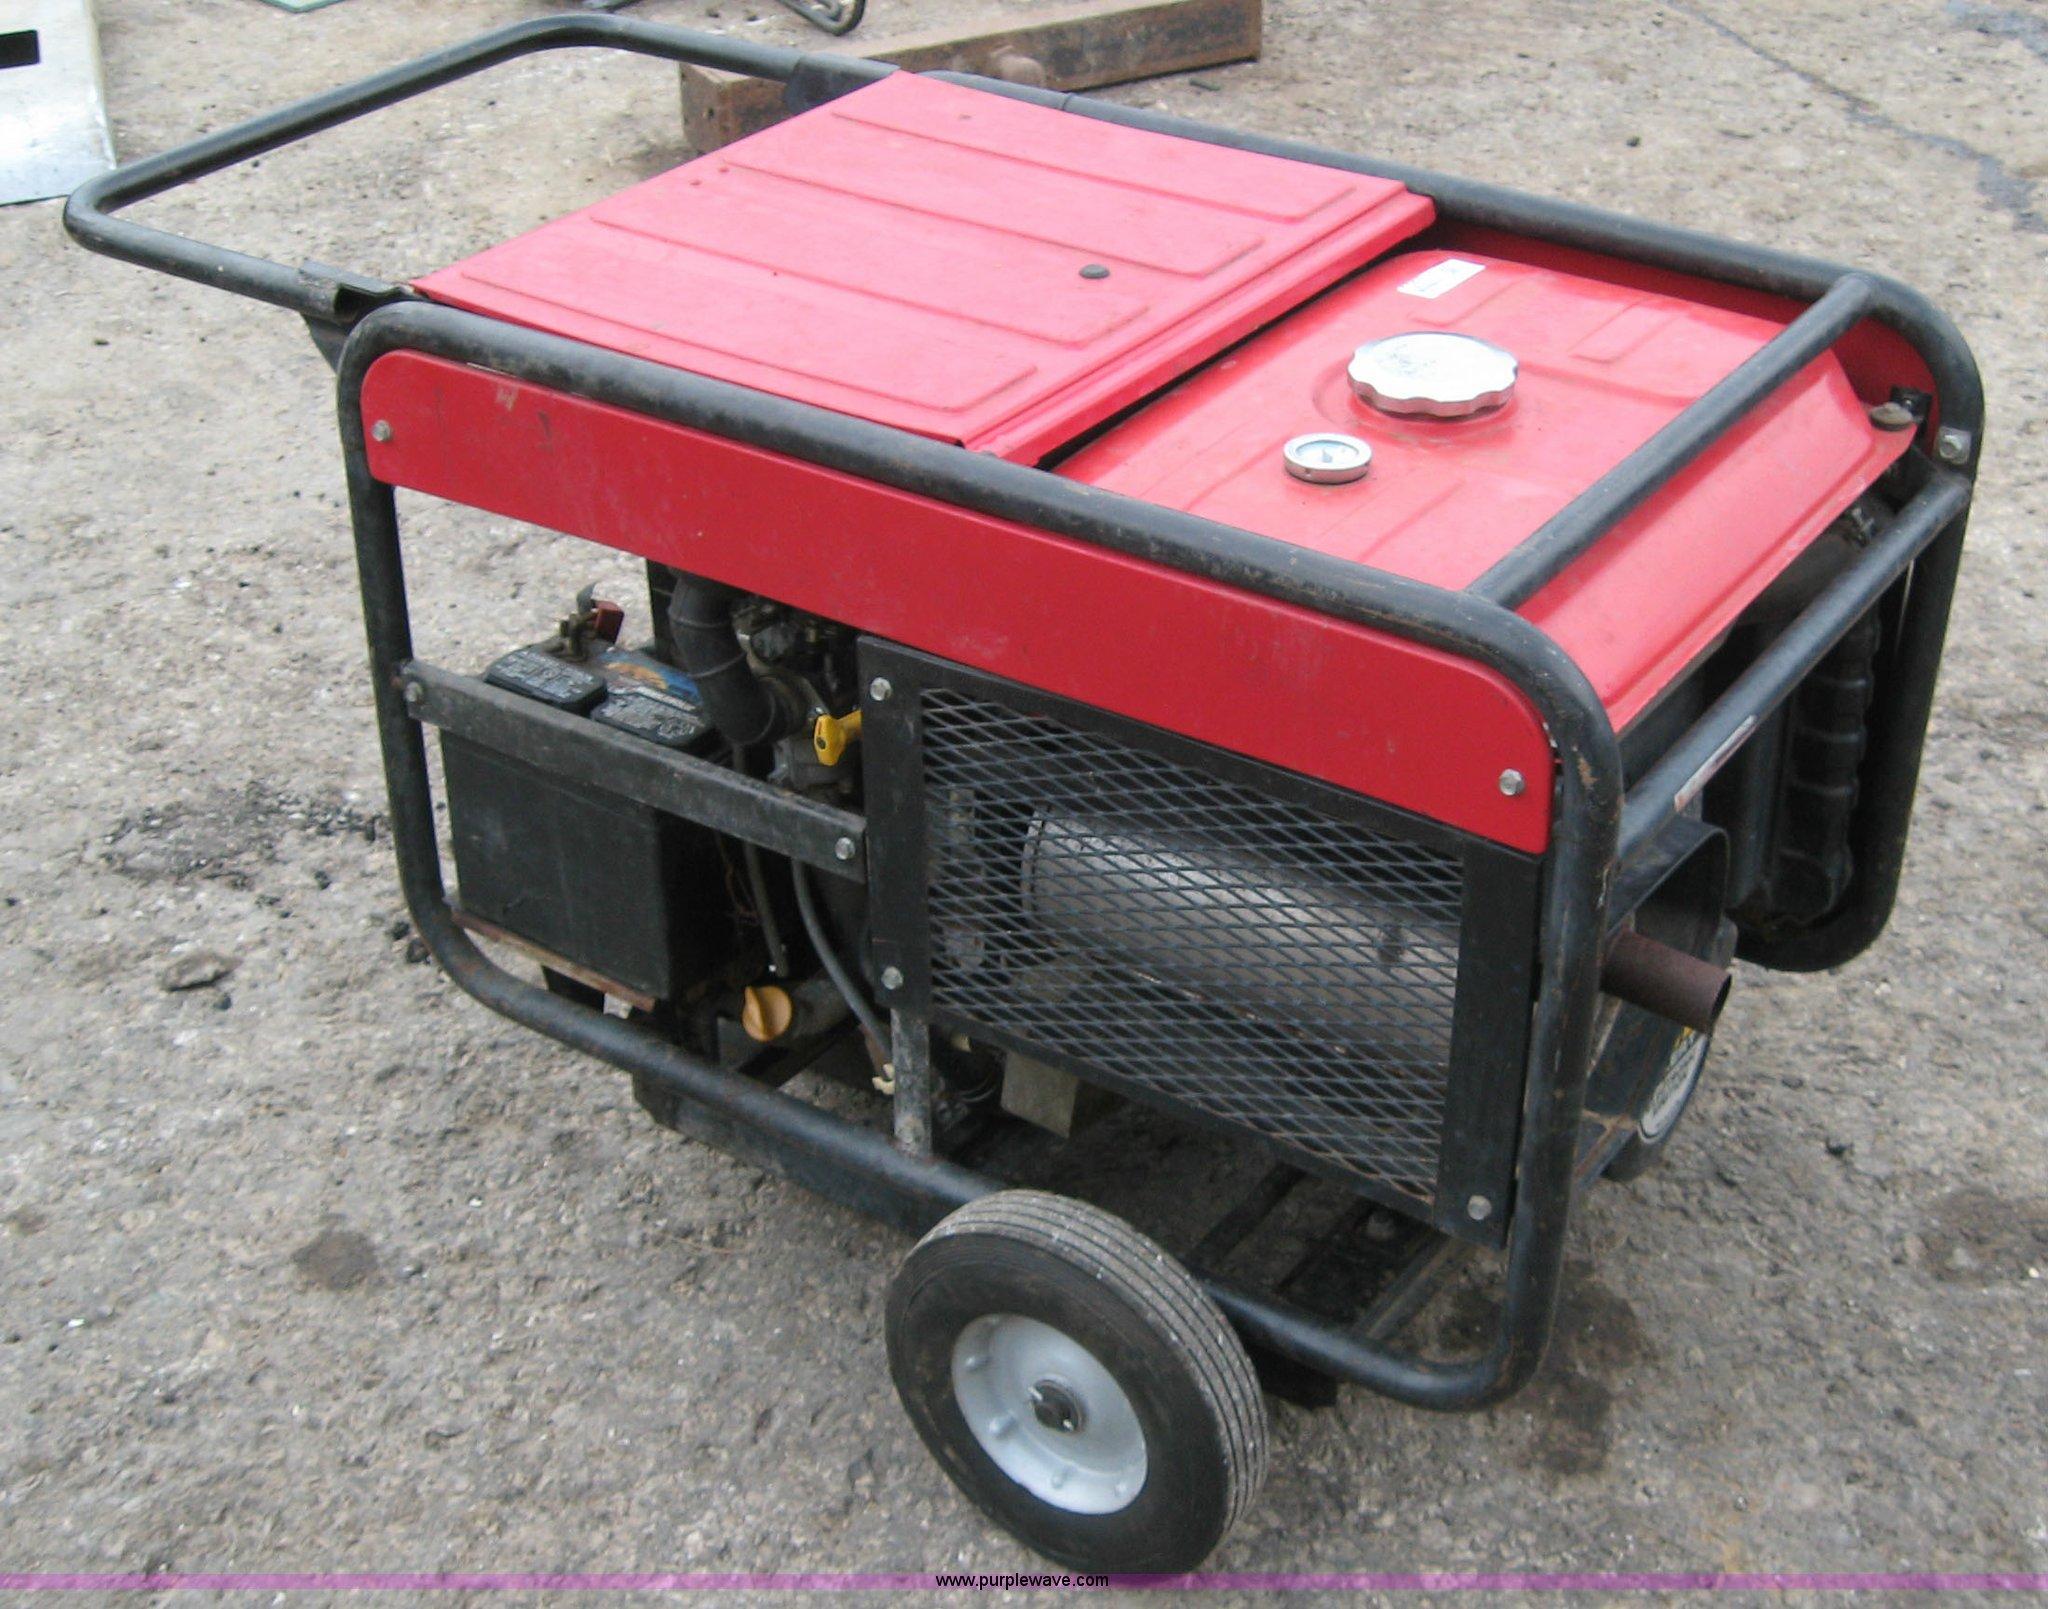 Honda ES6500 gas powered generator Item 5293